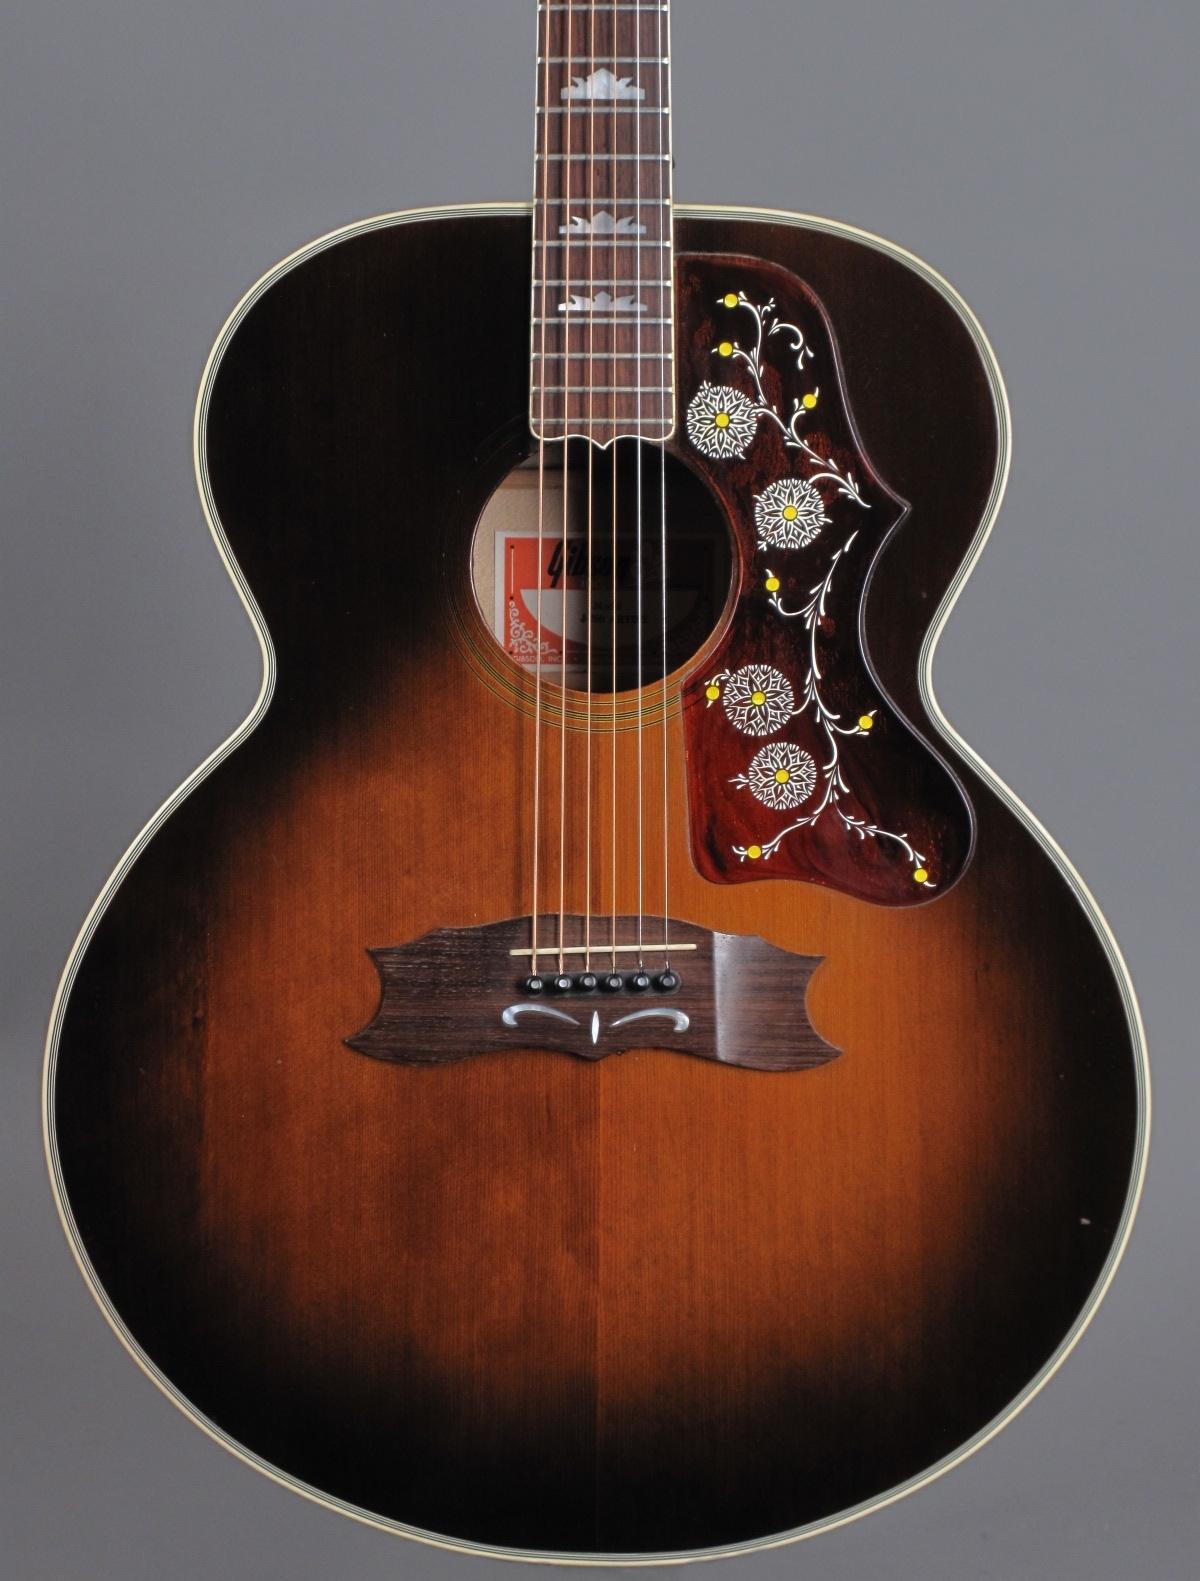 1981 Gibson J-200 Artist - Sunburst